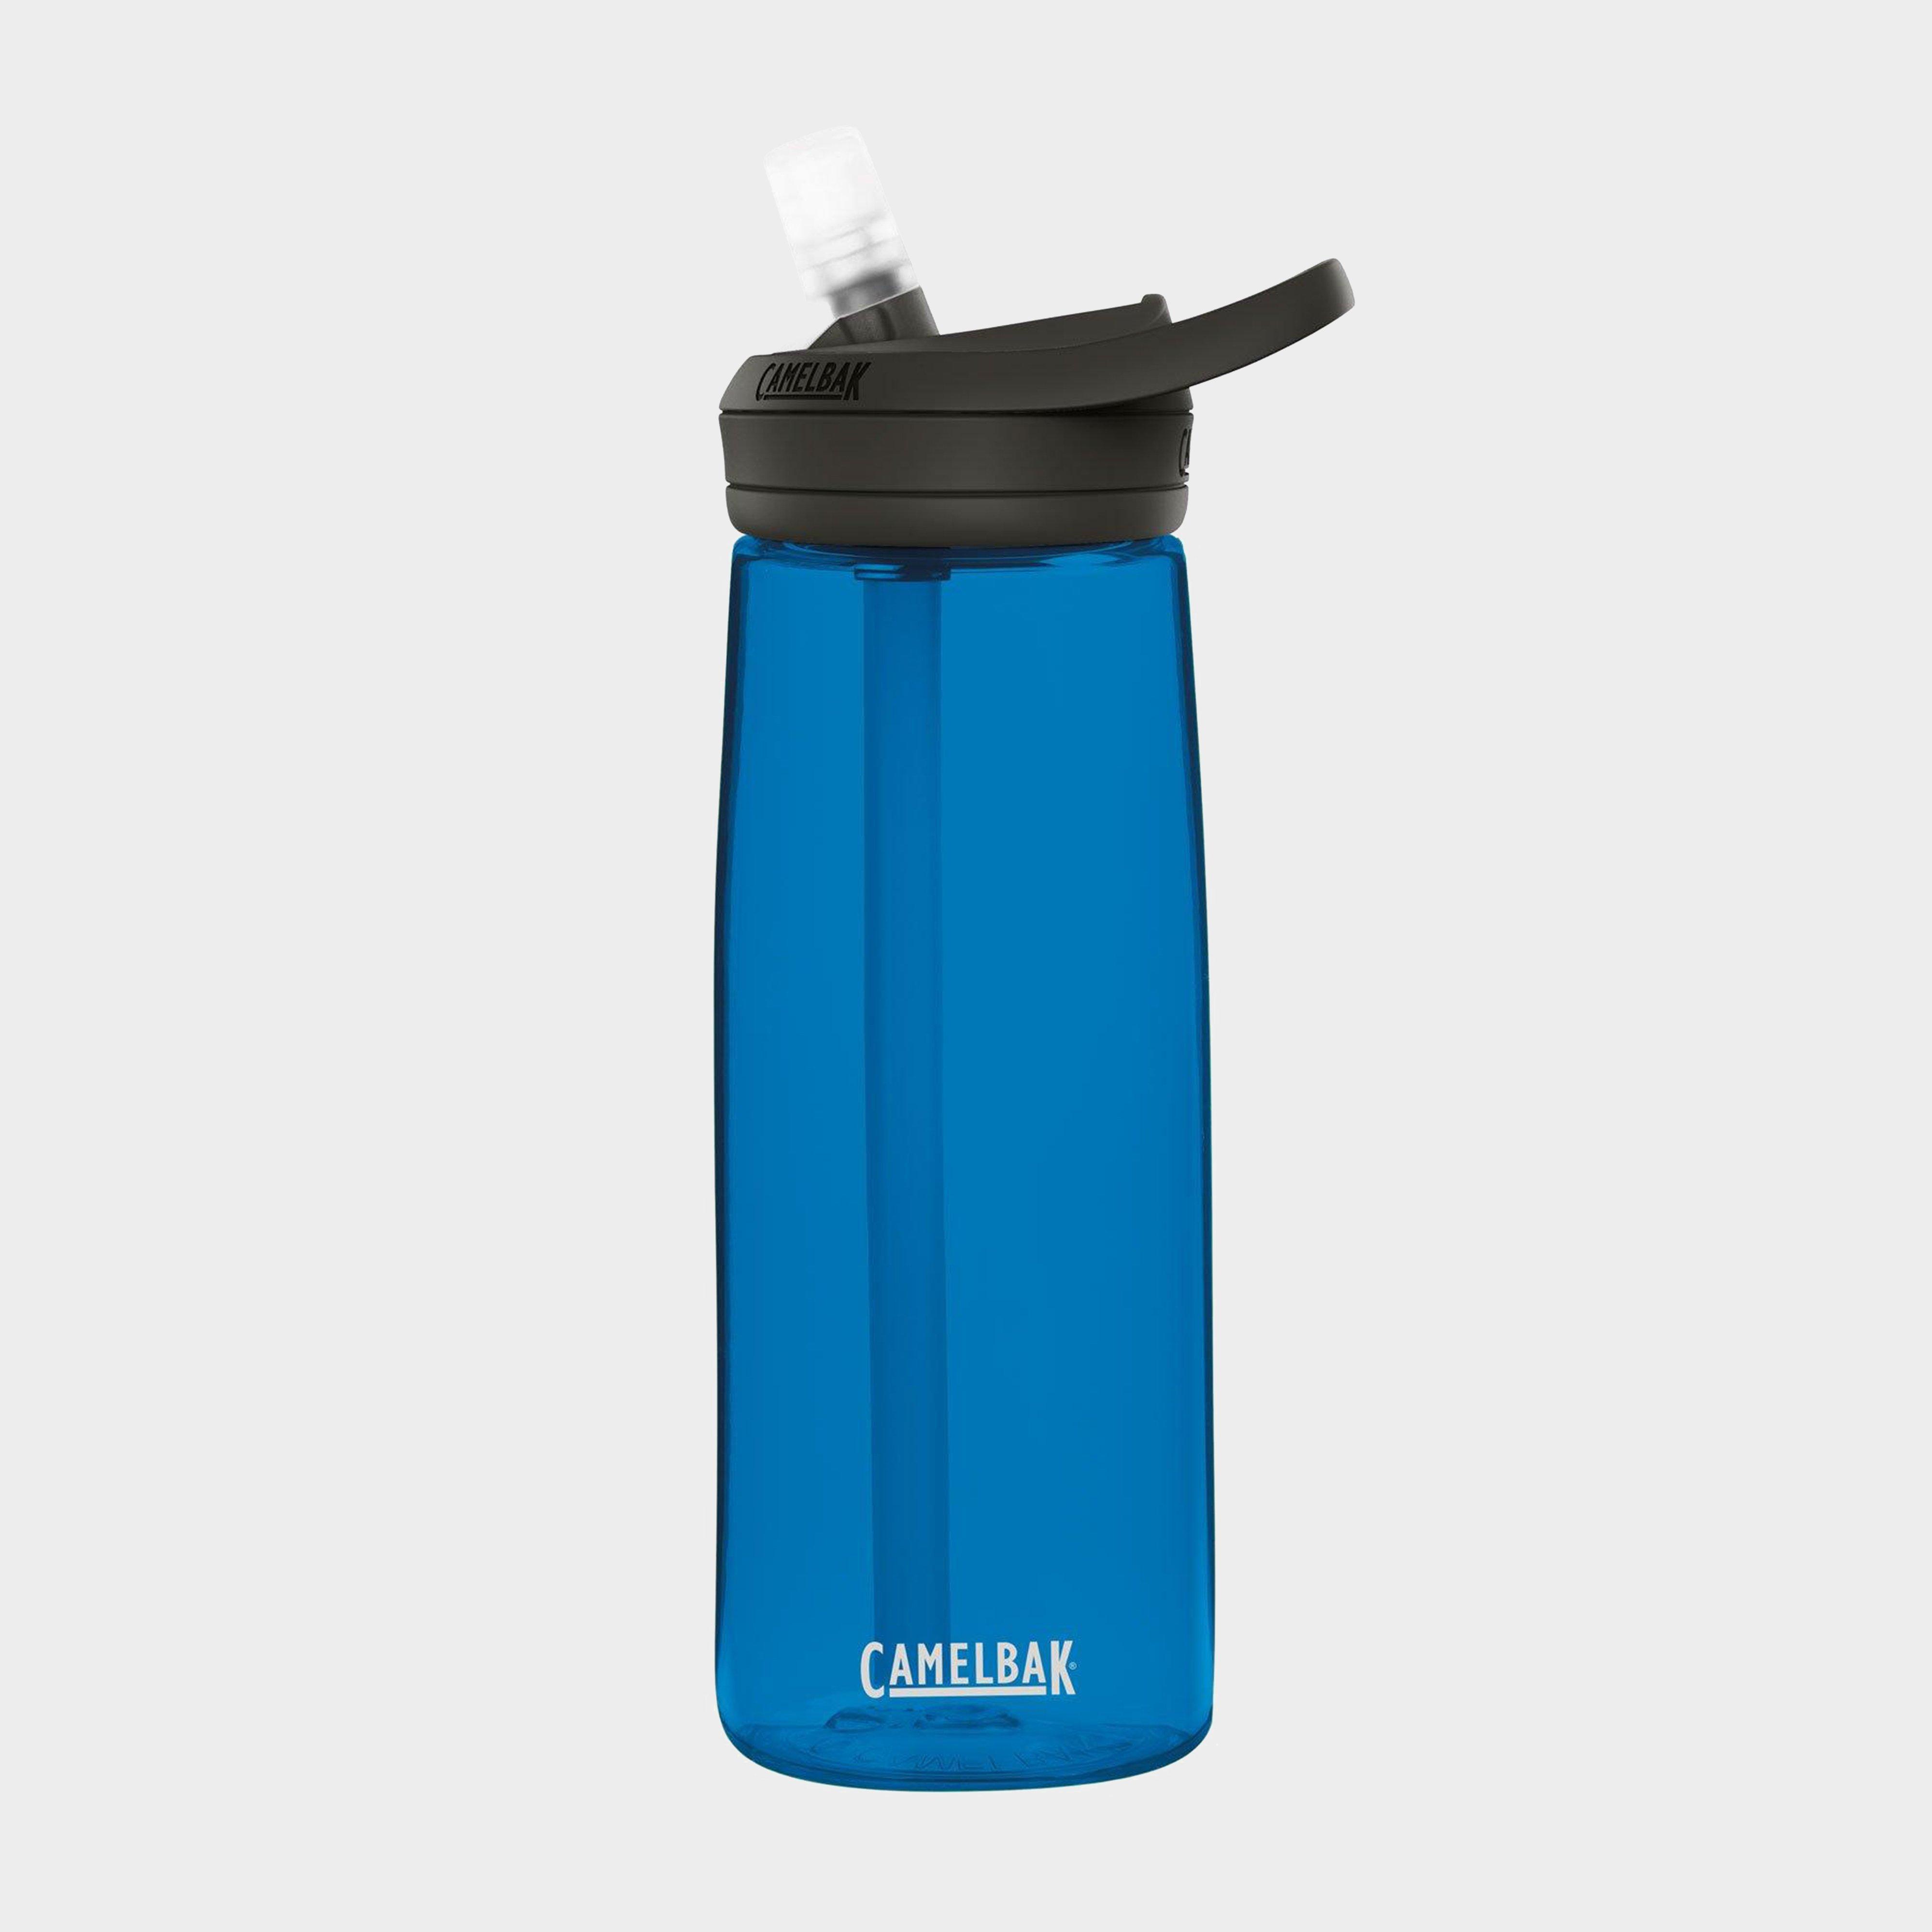 Camelbak Camelbak 0.75L Eddy+ Water Bottle - Blue, Blue